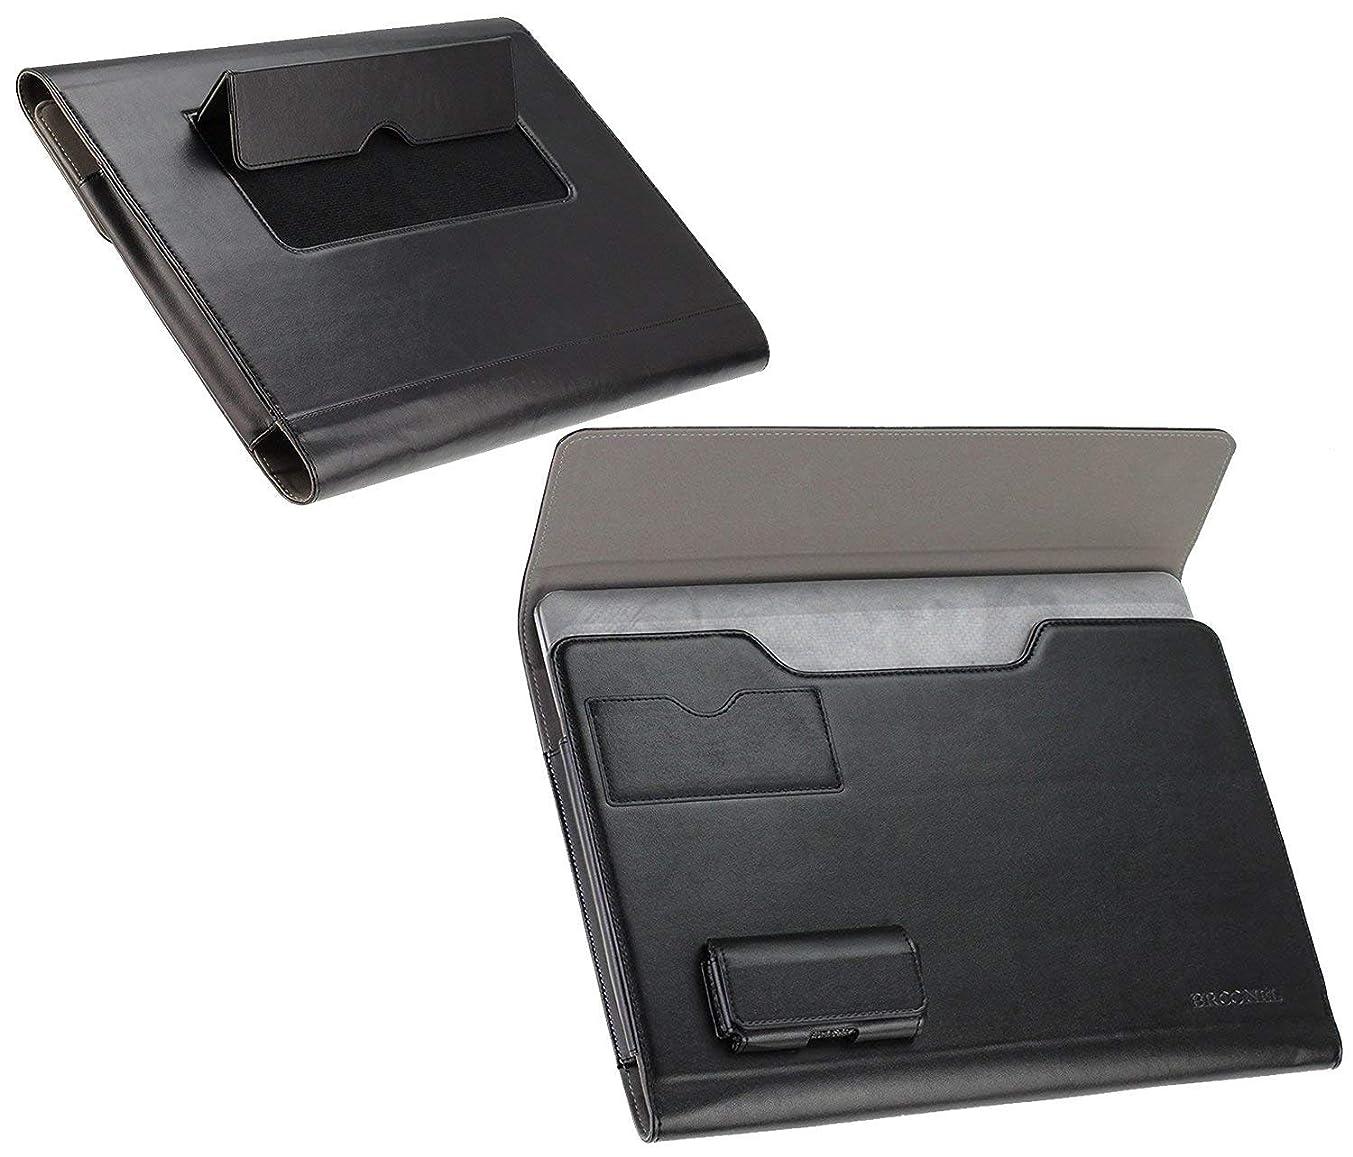 Broonel - Prestige - Black Luxury Laptop Folio Case Cover Compatible with The ASUS Zenbook UX331 / ASUS Zenbook Flip S UX370 / ASUS Chromebook Flip C434 14